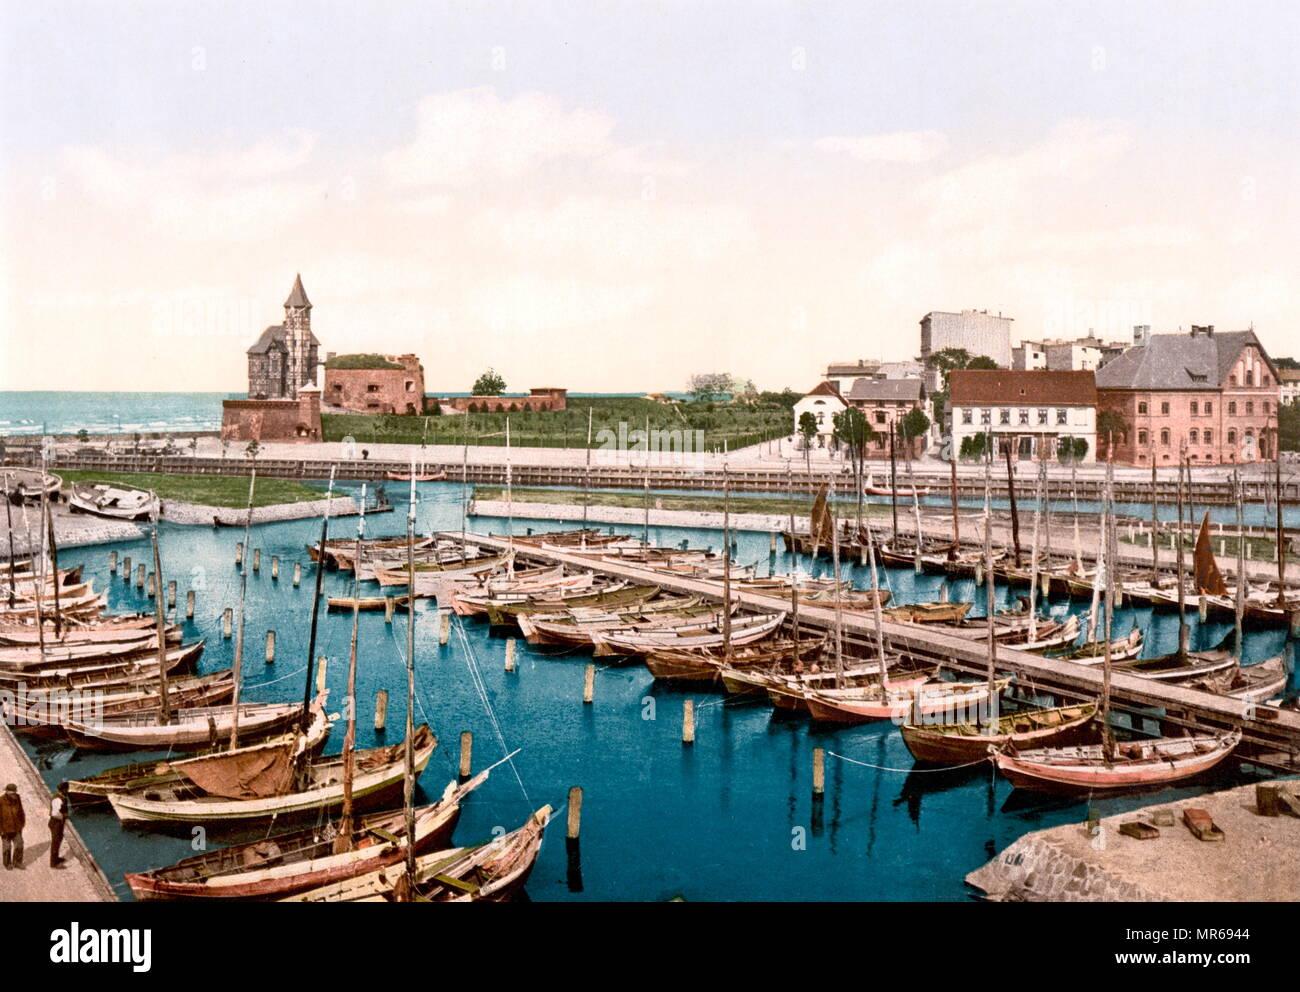 1900 colour postcard showing the Harbour and pilot station, Colberg, Pomerania, Germany Kołobrzeg (Poland) - Stock Image